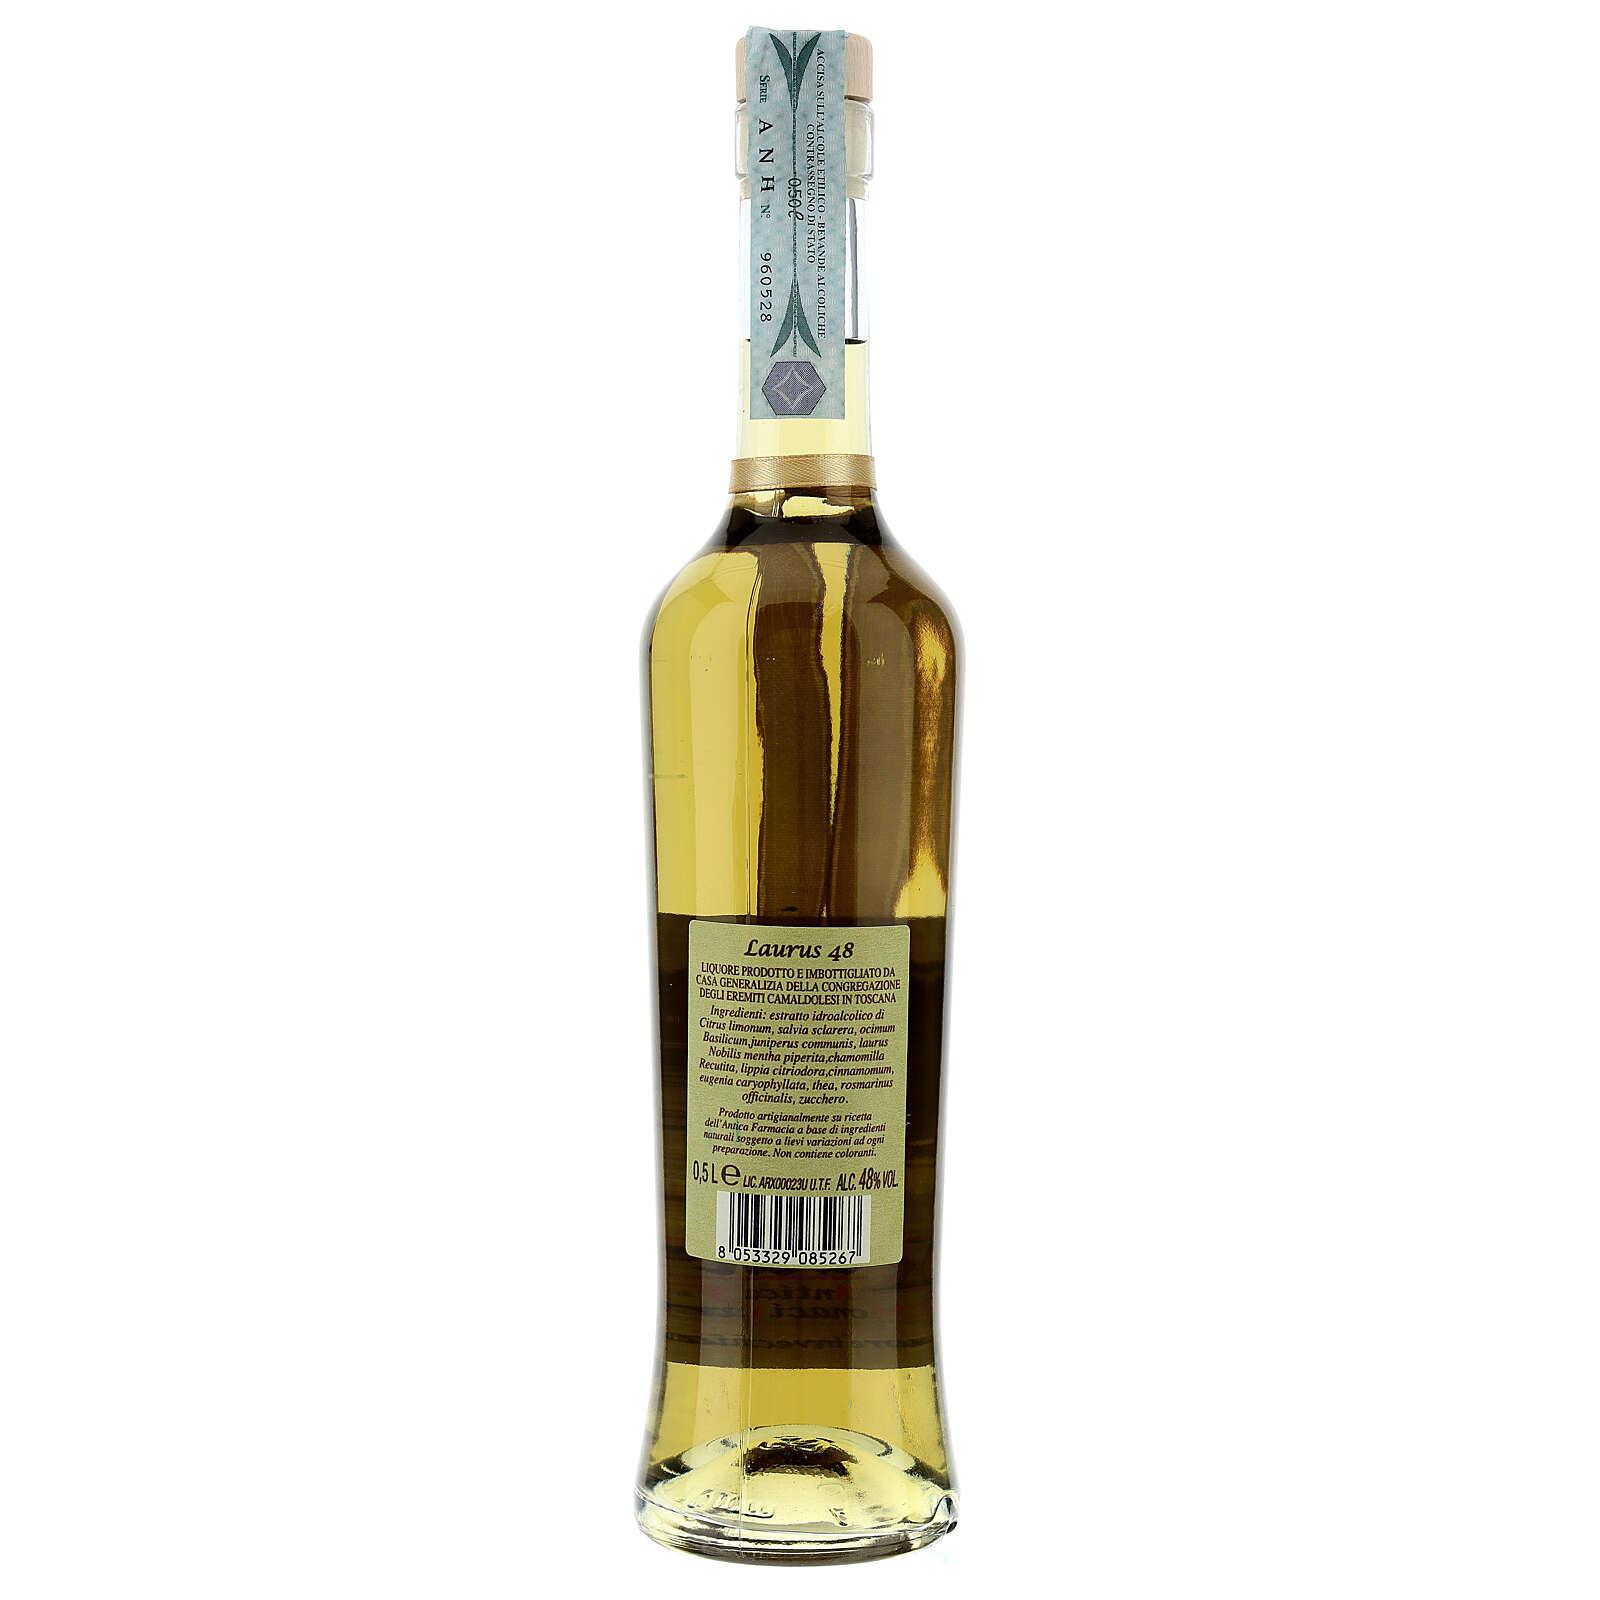 Laurus 48 Vieilli 5 ans 500 ml Camaldoli 3